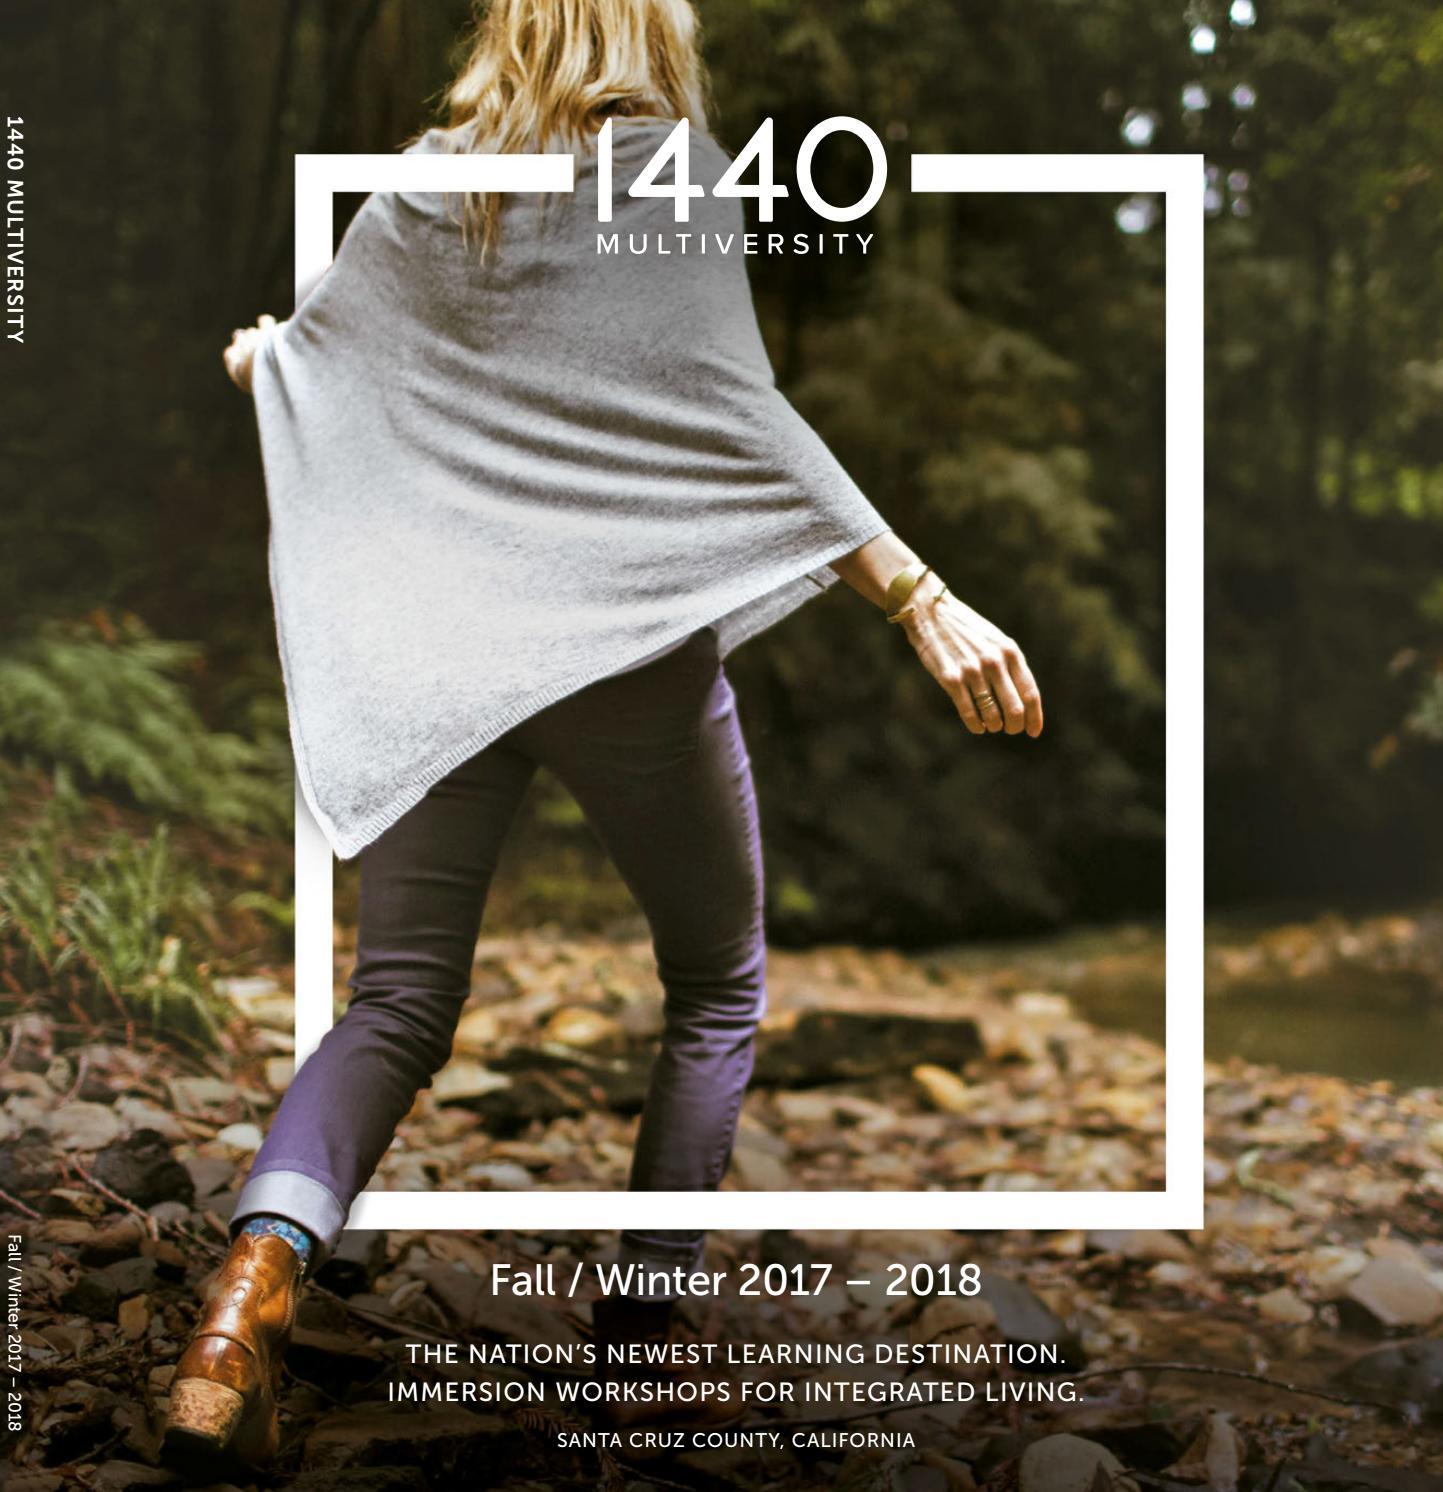 1440 multiversity fall winter 2017 u2013 2018 catalog by 1440